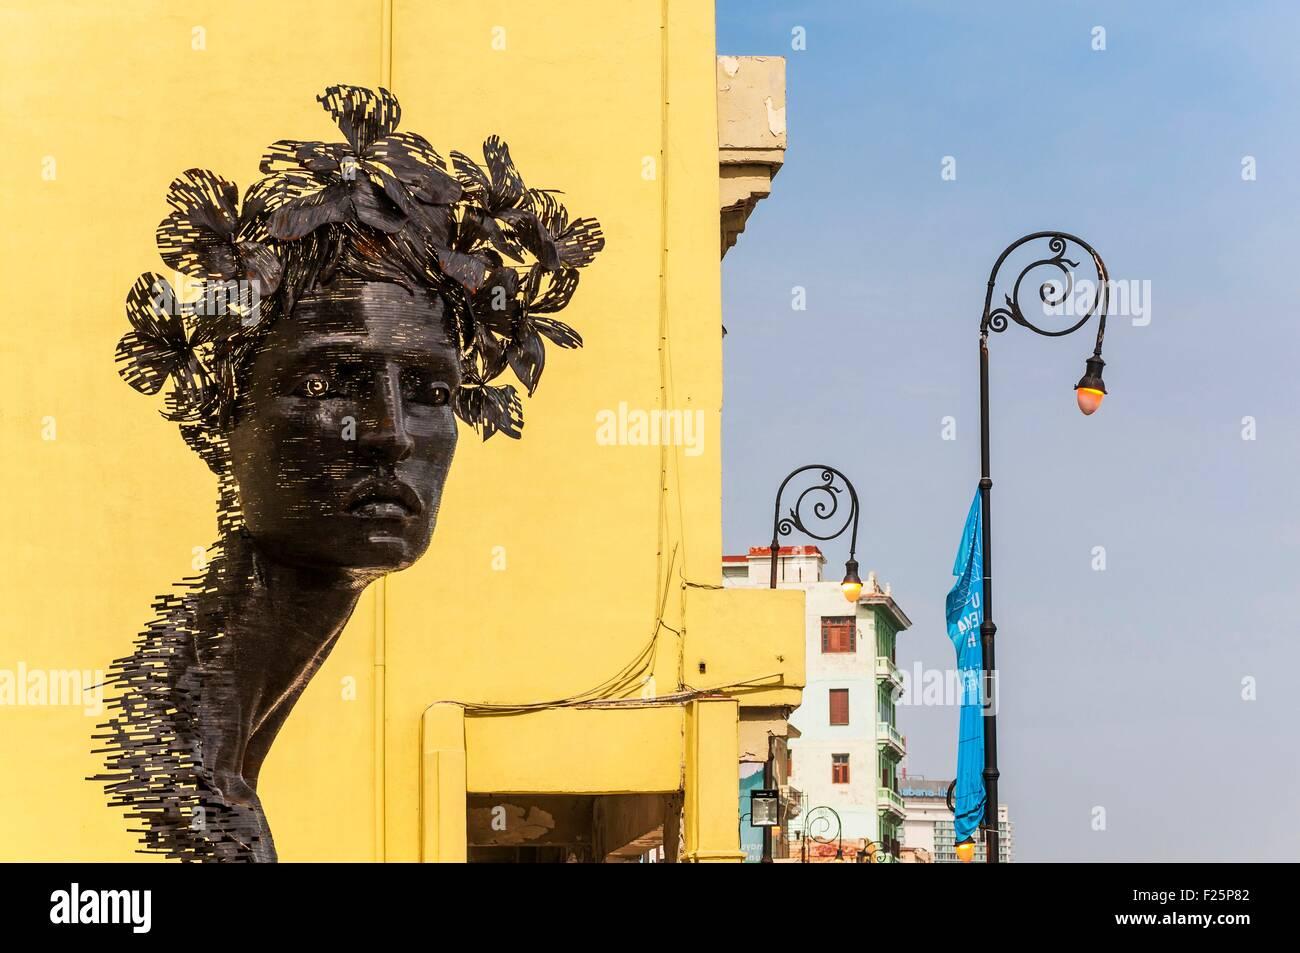 Cuba, Havana, Malecon, exhibited work at the Biennale - Stock Image